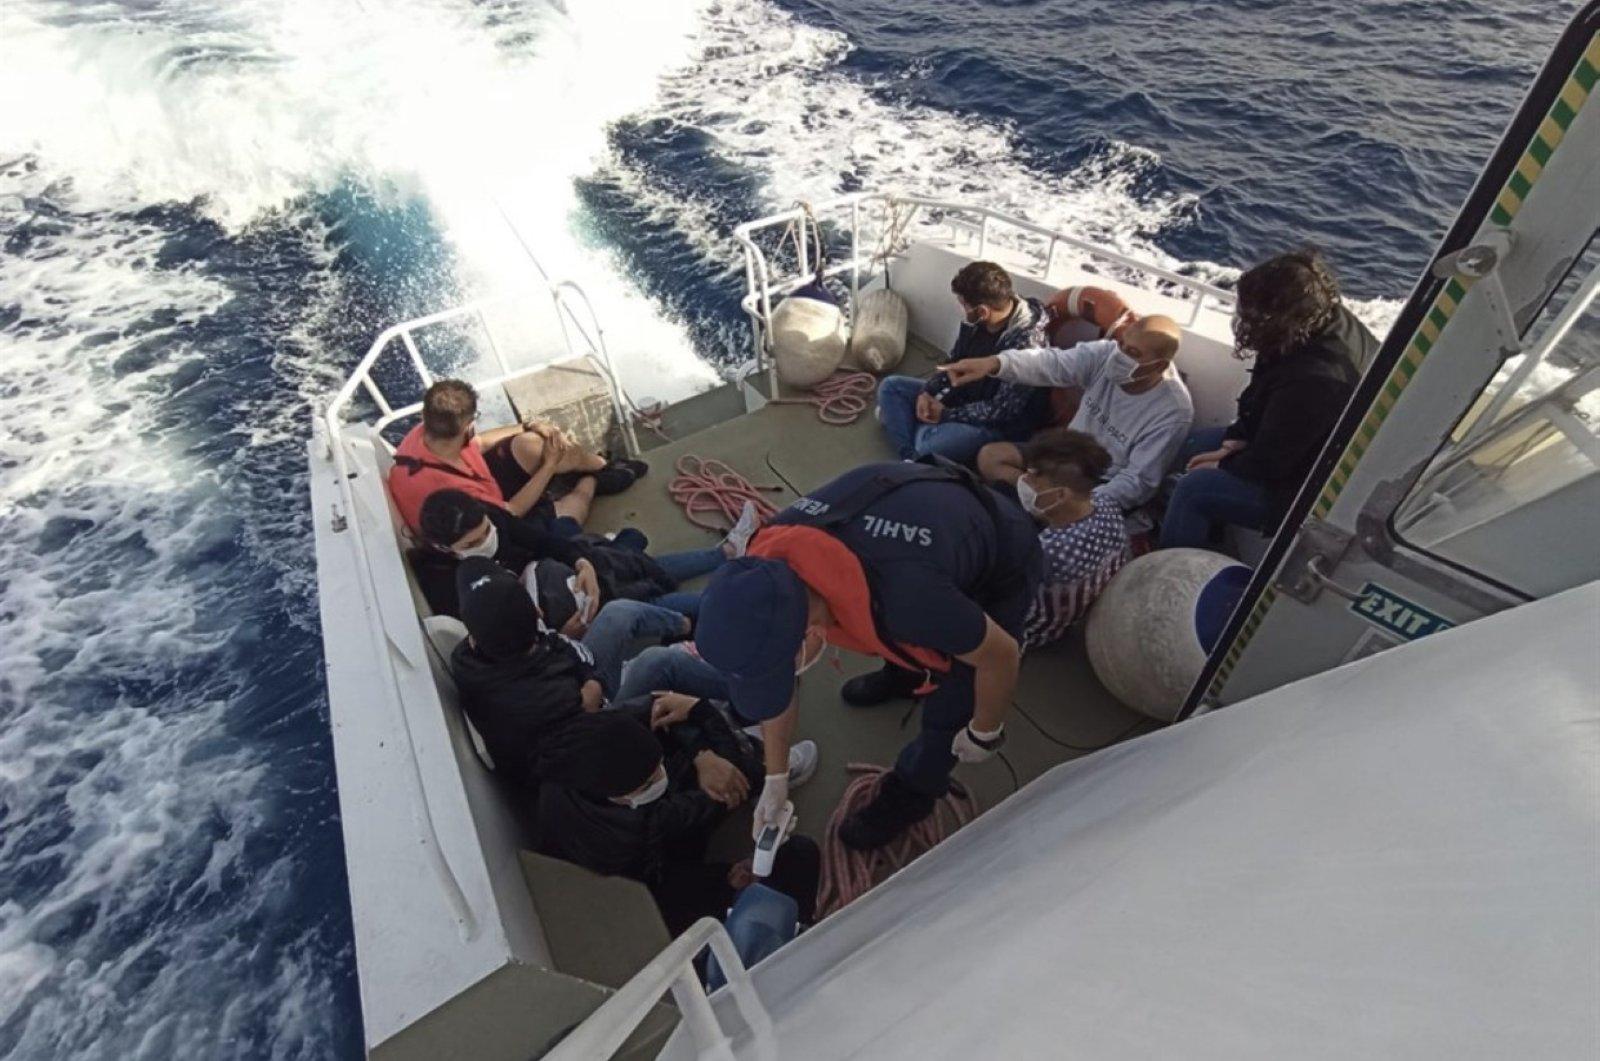 The Turkish Coast Guard rescue 10 asylum-seekers from a boat off the coast of Bodrum, Muğla province, Turkey, June 17, 2020. (İHA Photo)